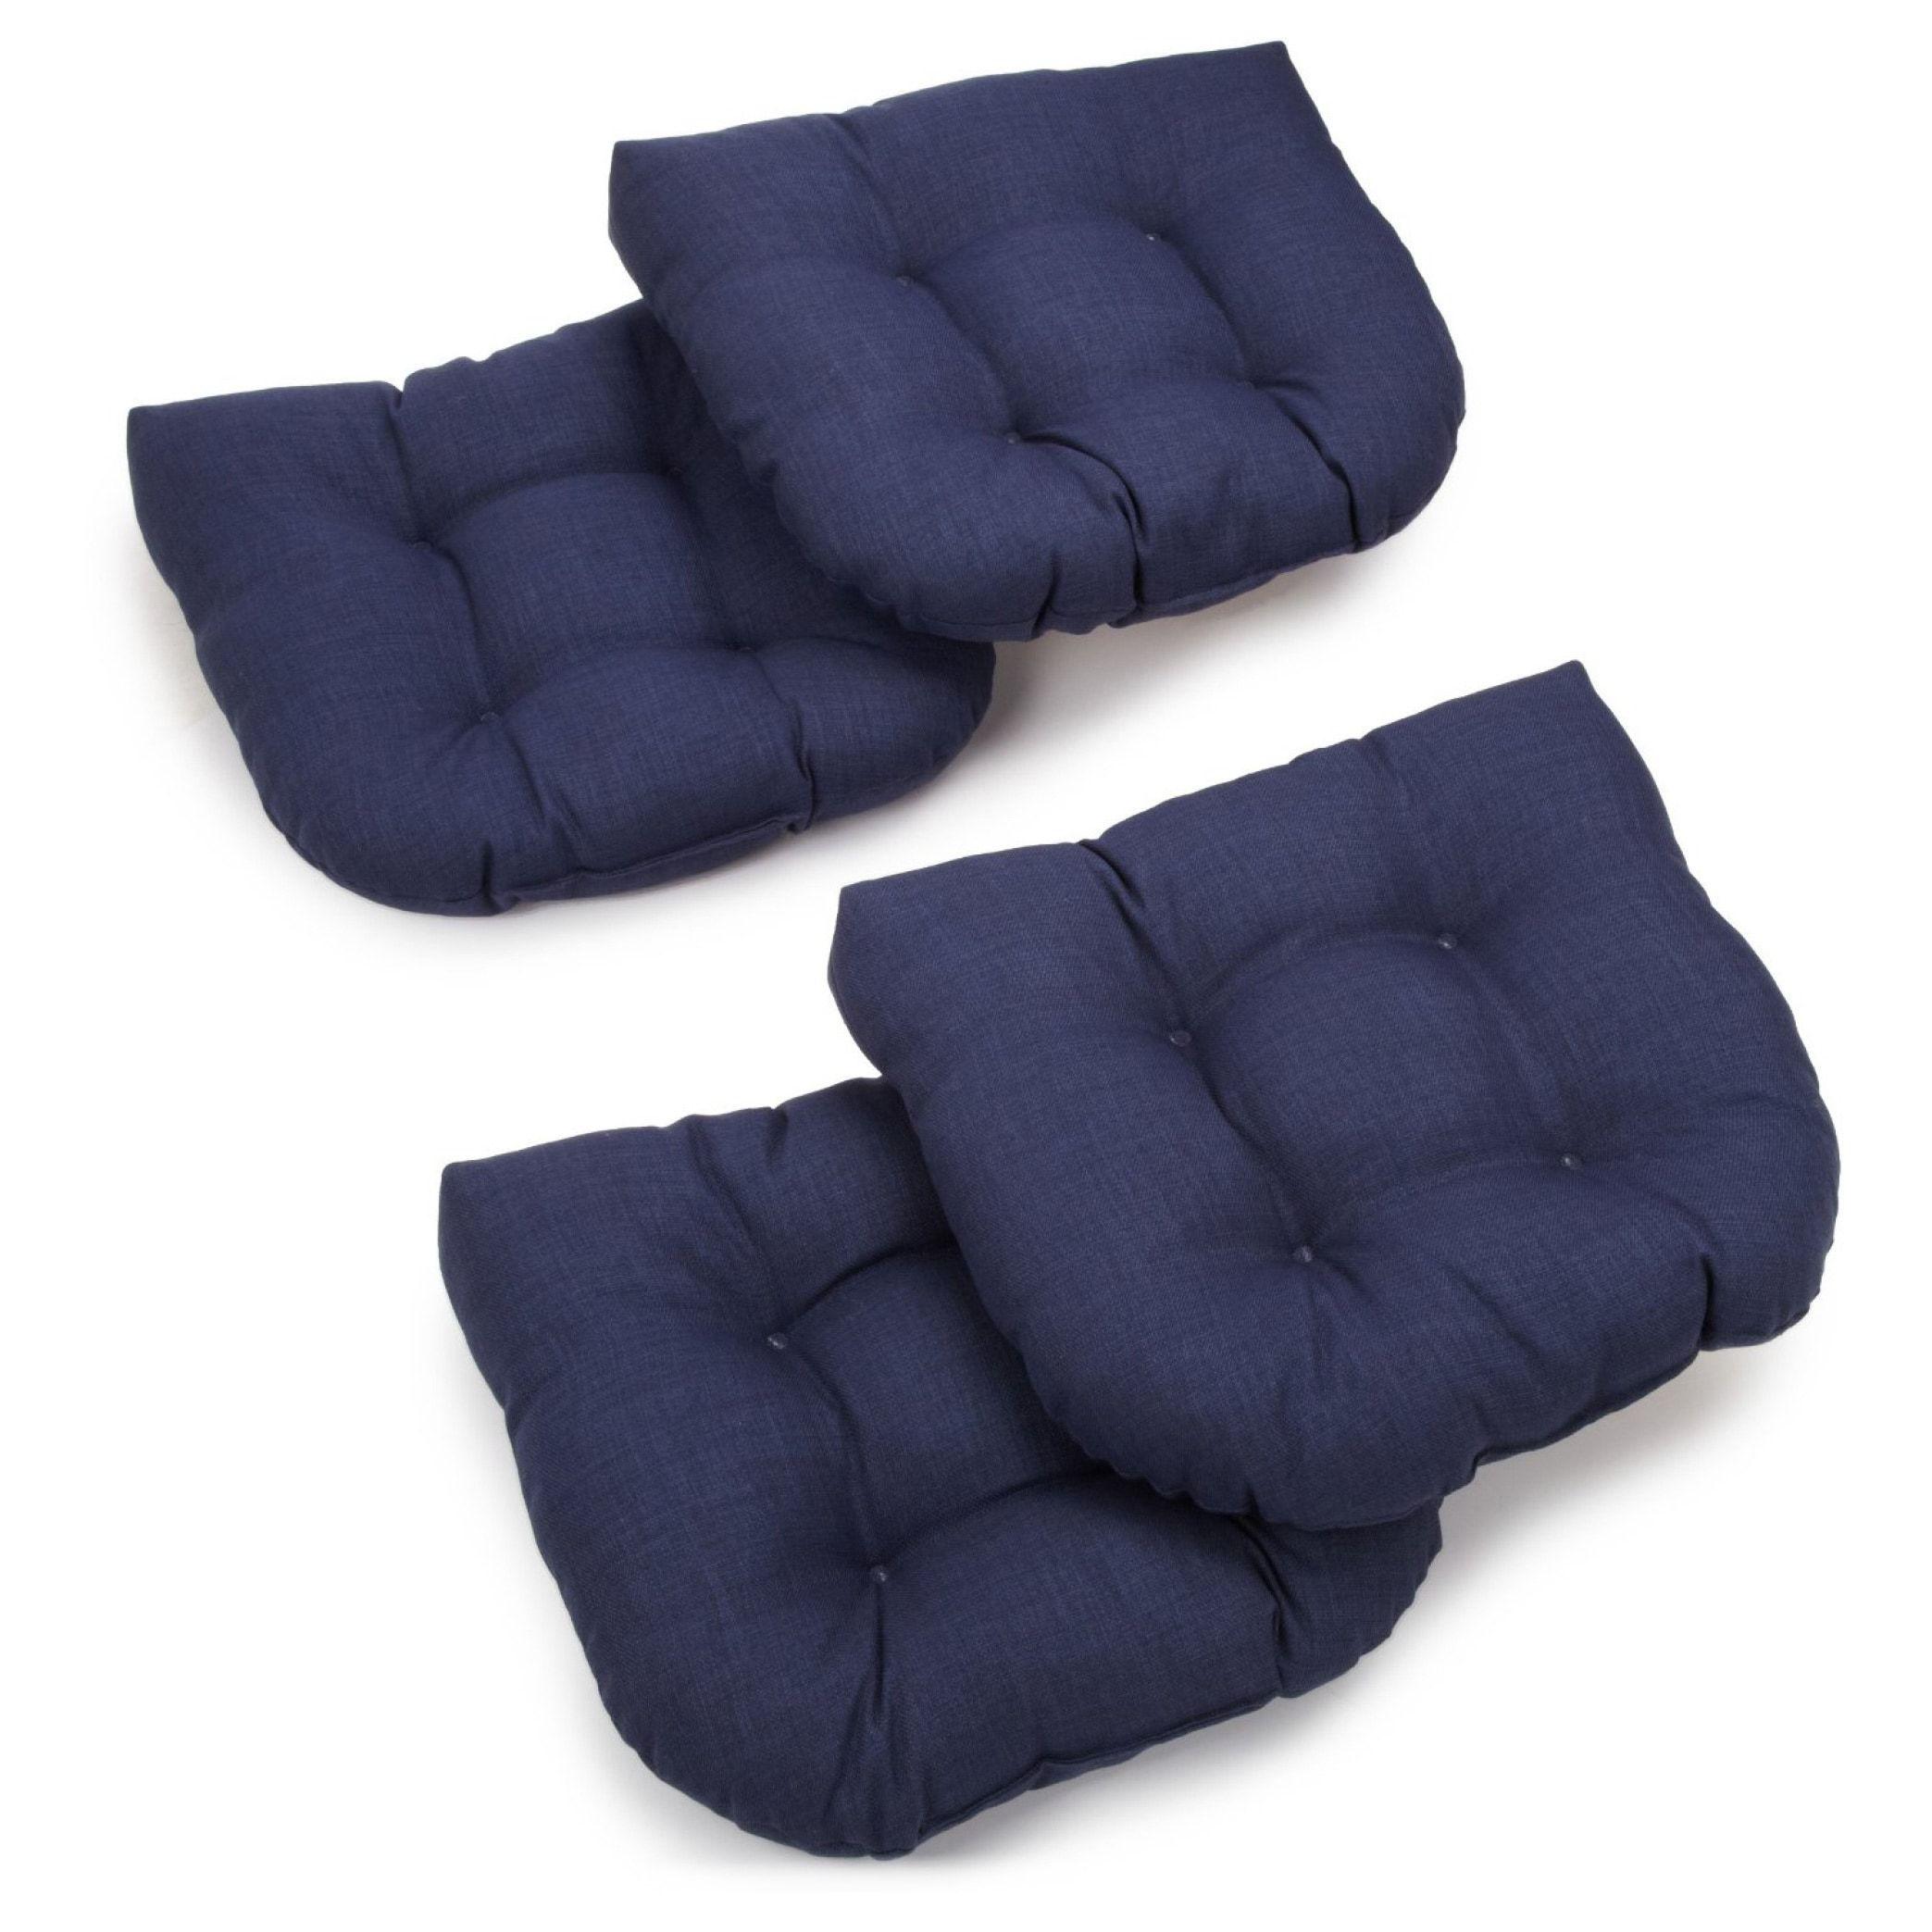 Blazing Needles 19inch Indoor/Outdoor Chair Cushion (Set